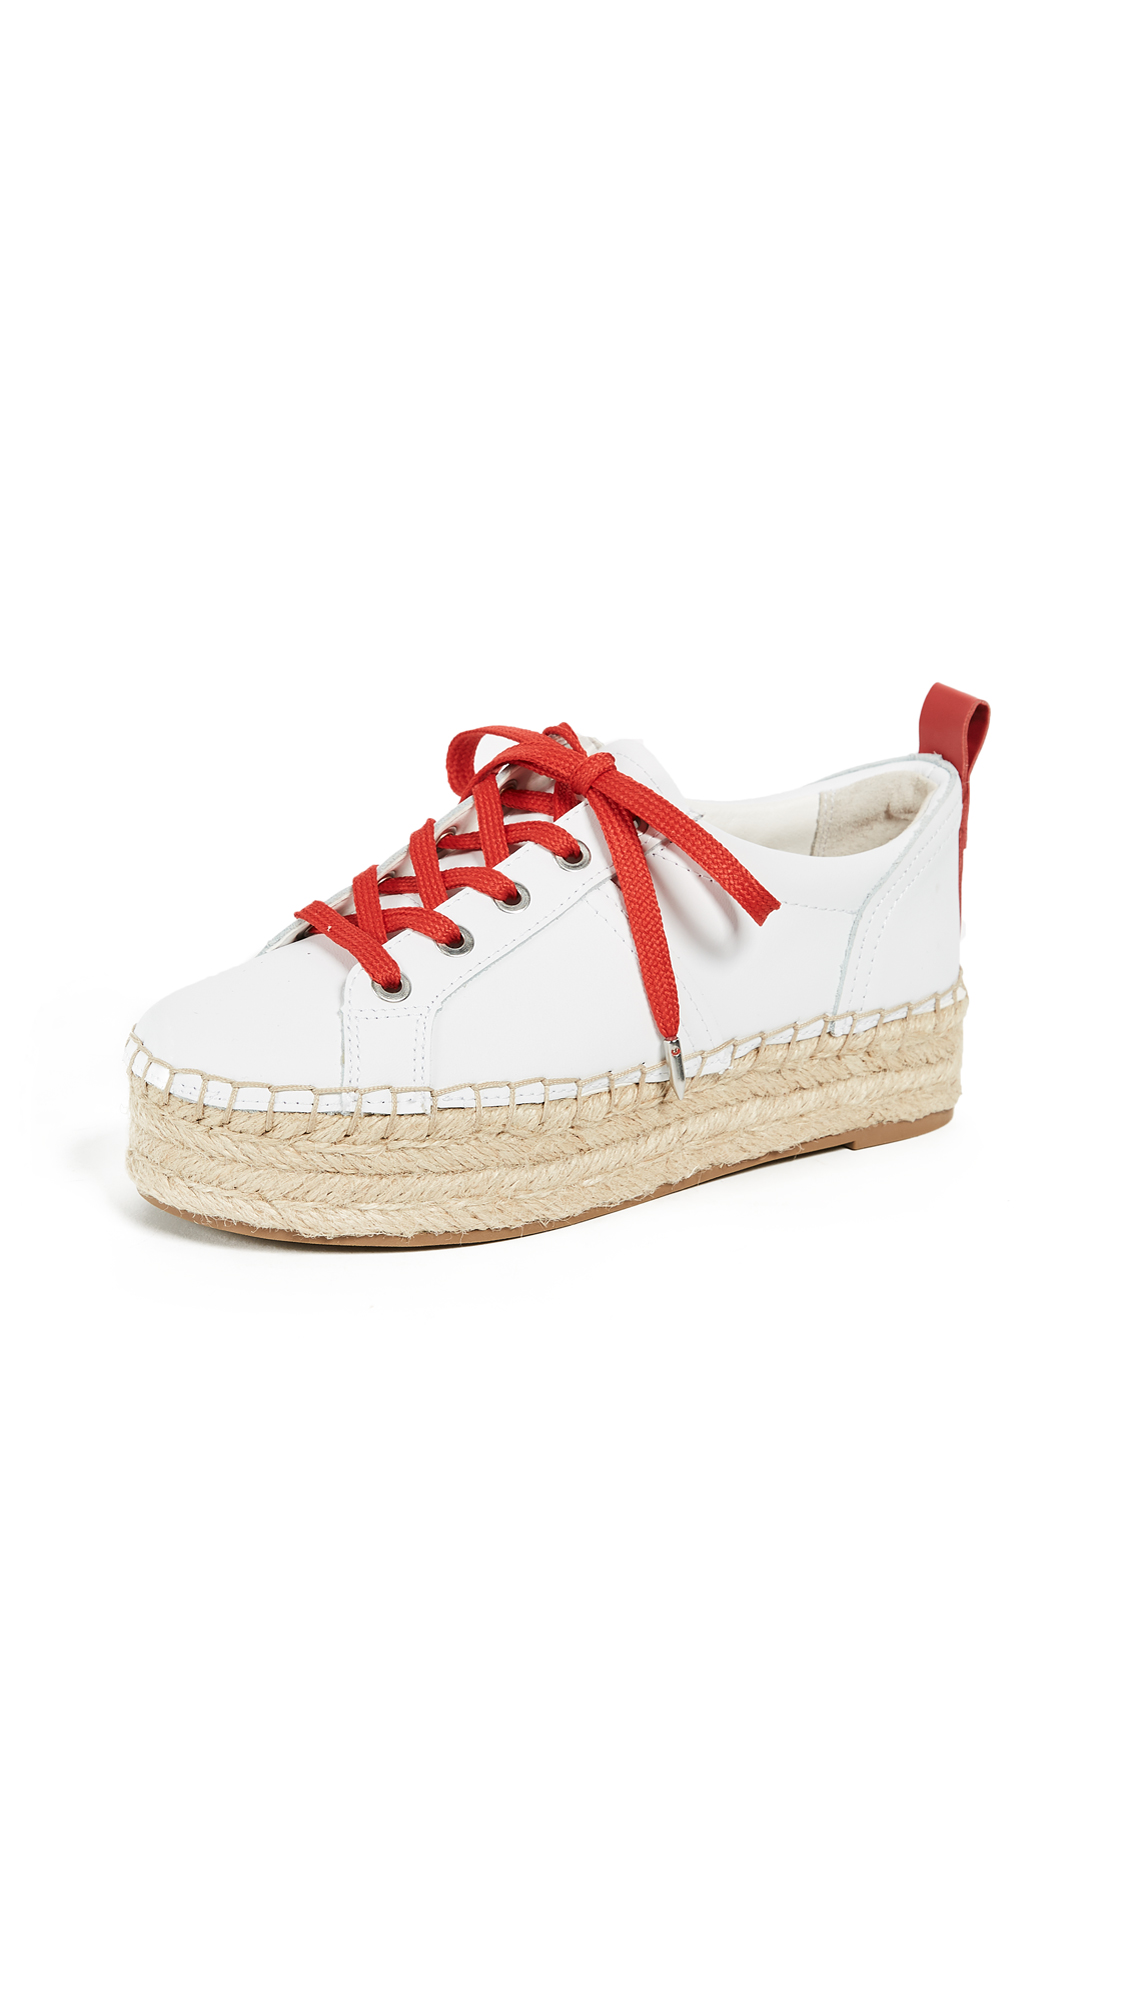 Sam Edelman Carleigh Platform Espadrille Sneakers - Super White/Candy Red